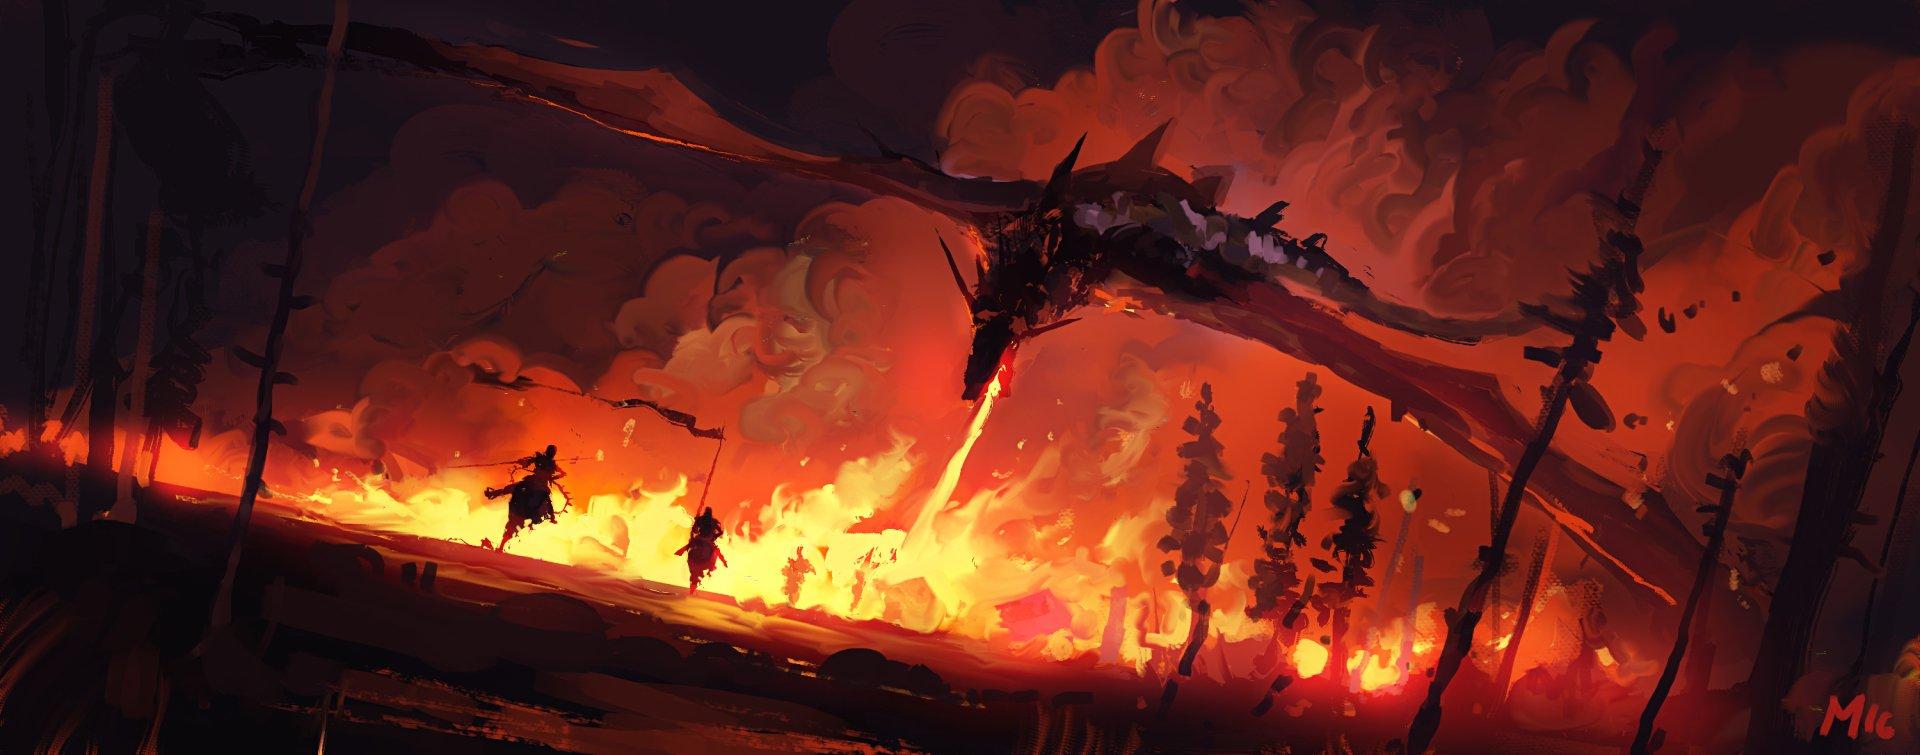 Fantasy - Dragon  Warrior Fire Wallpaper